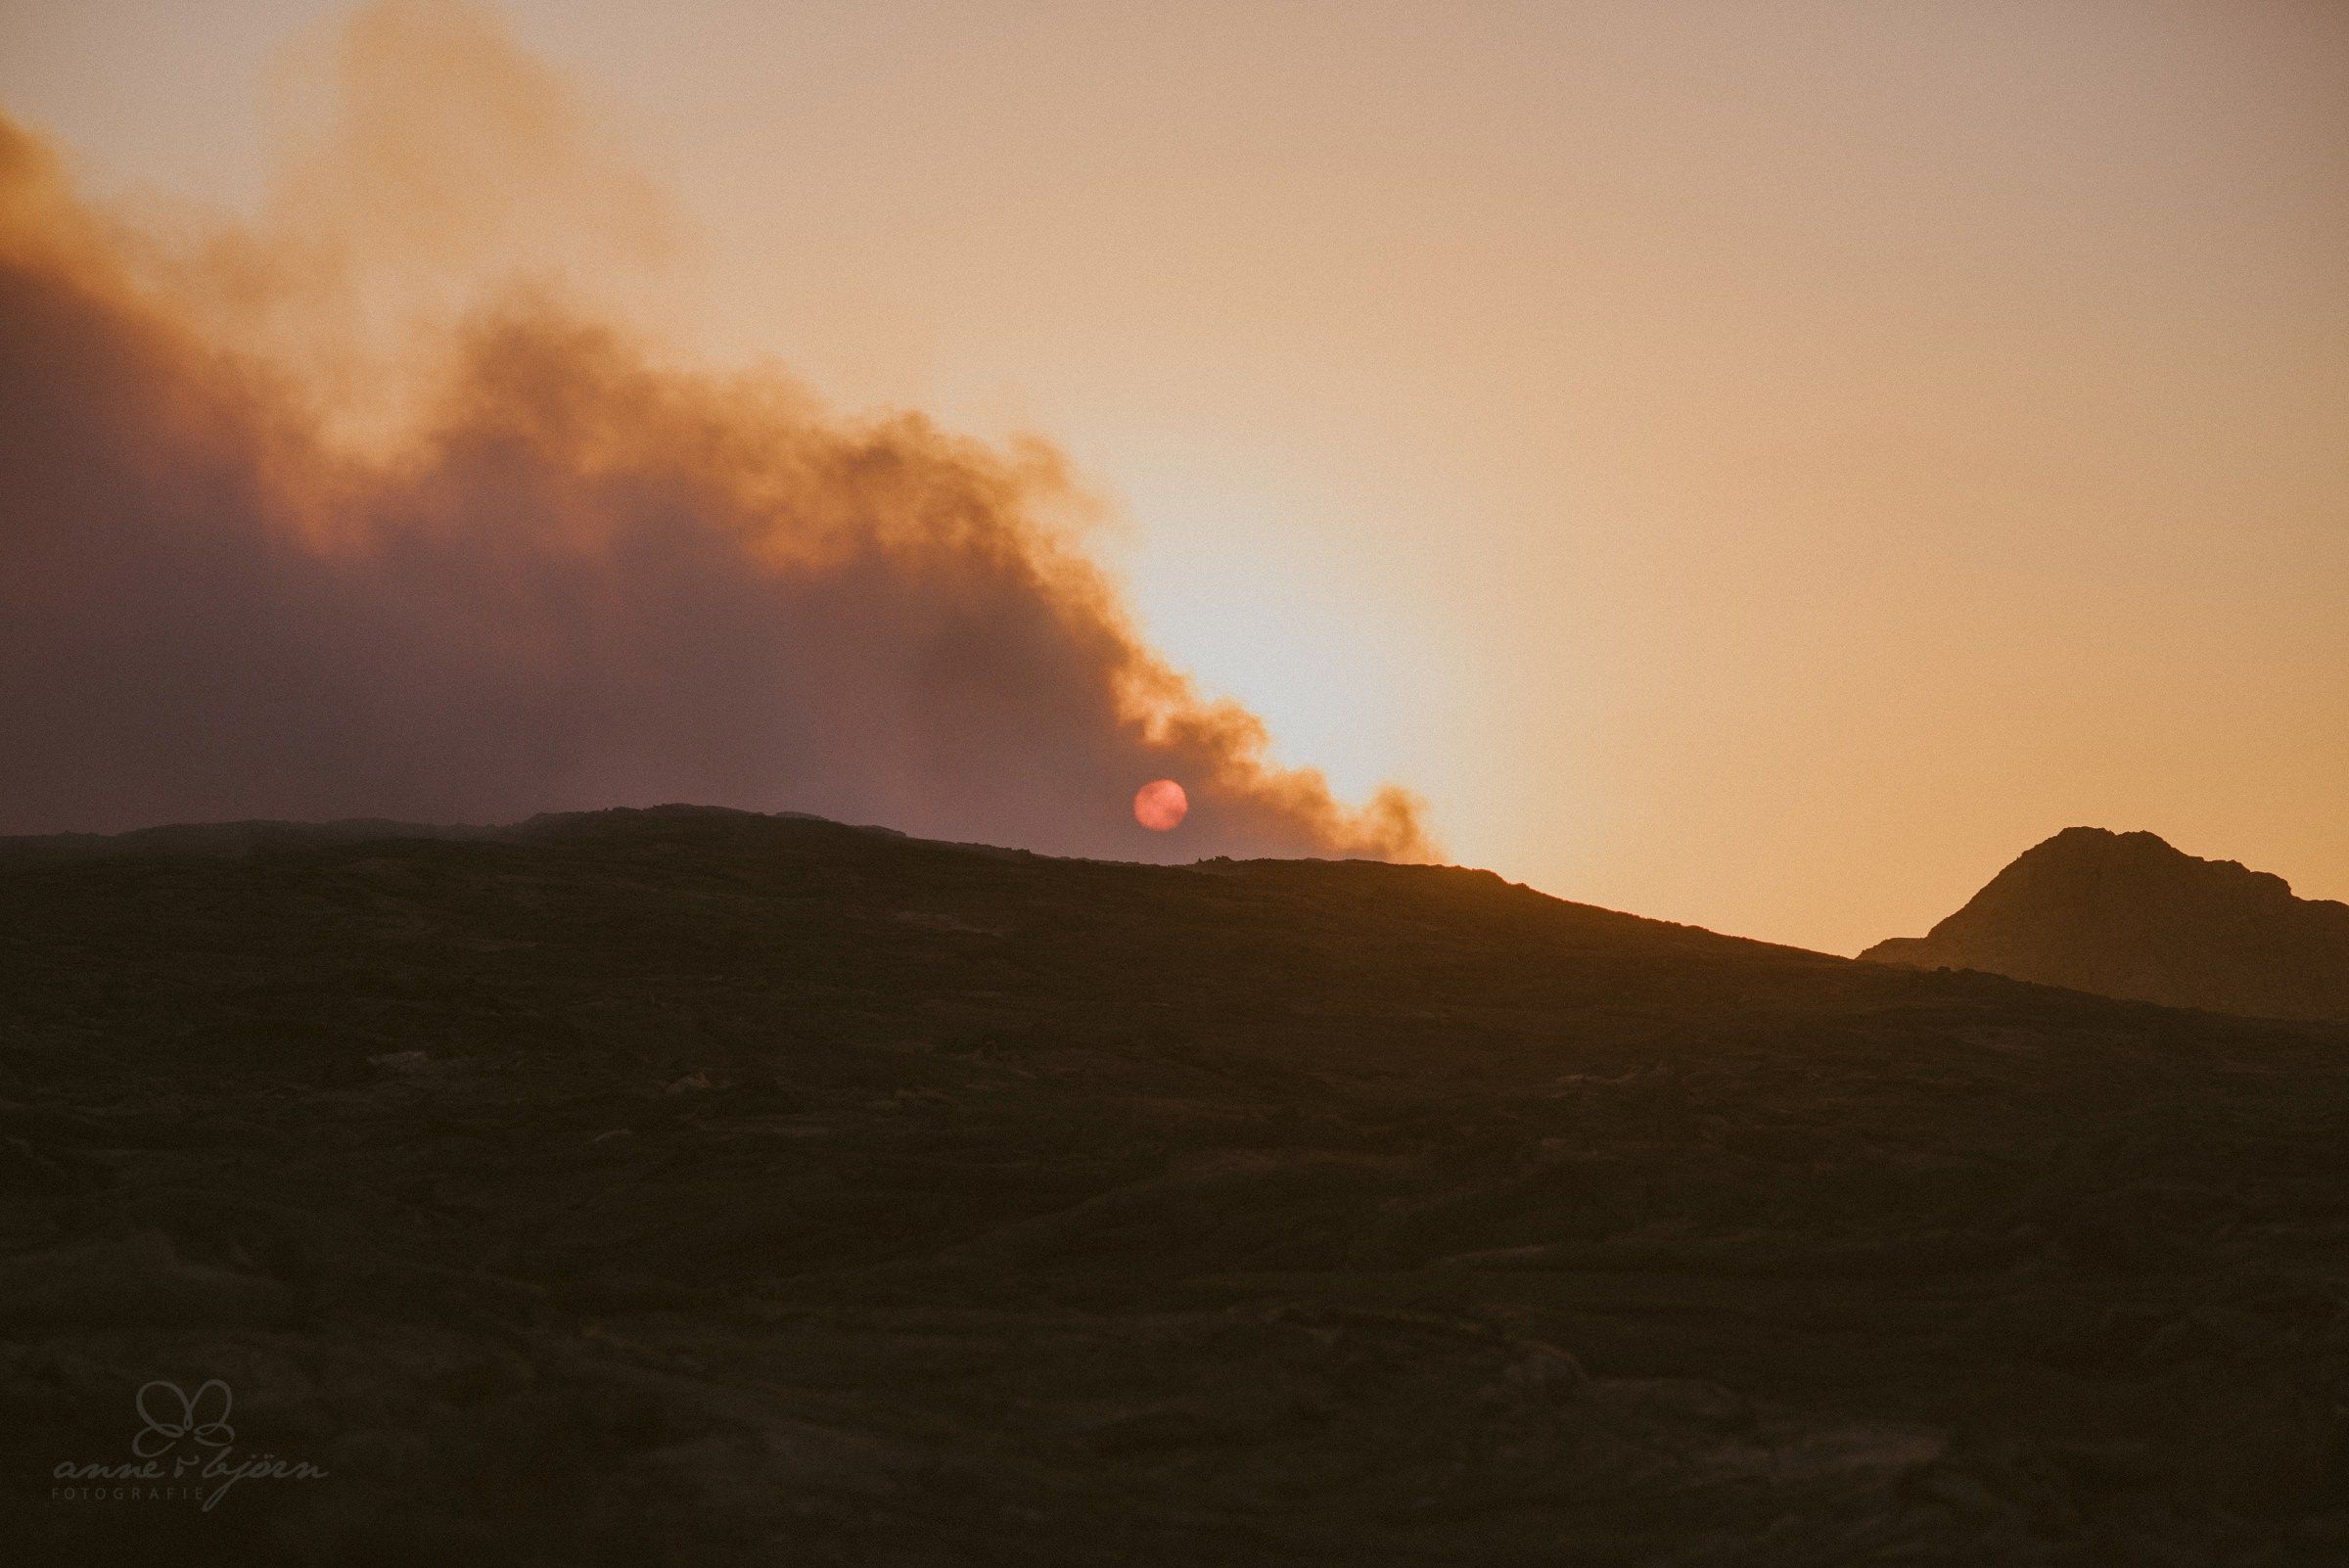 Sonnenaufgang, Vulkan, Lava, Ausbruch, Lavasee, Afrika, Äthiopien